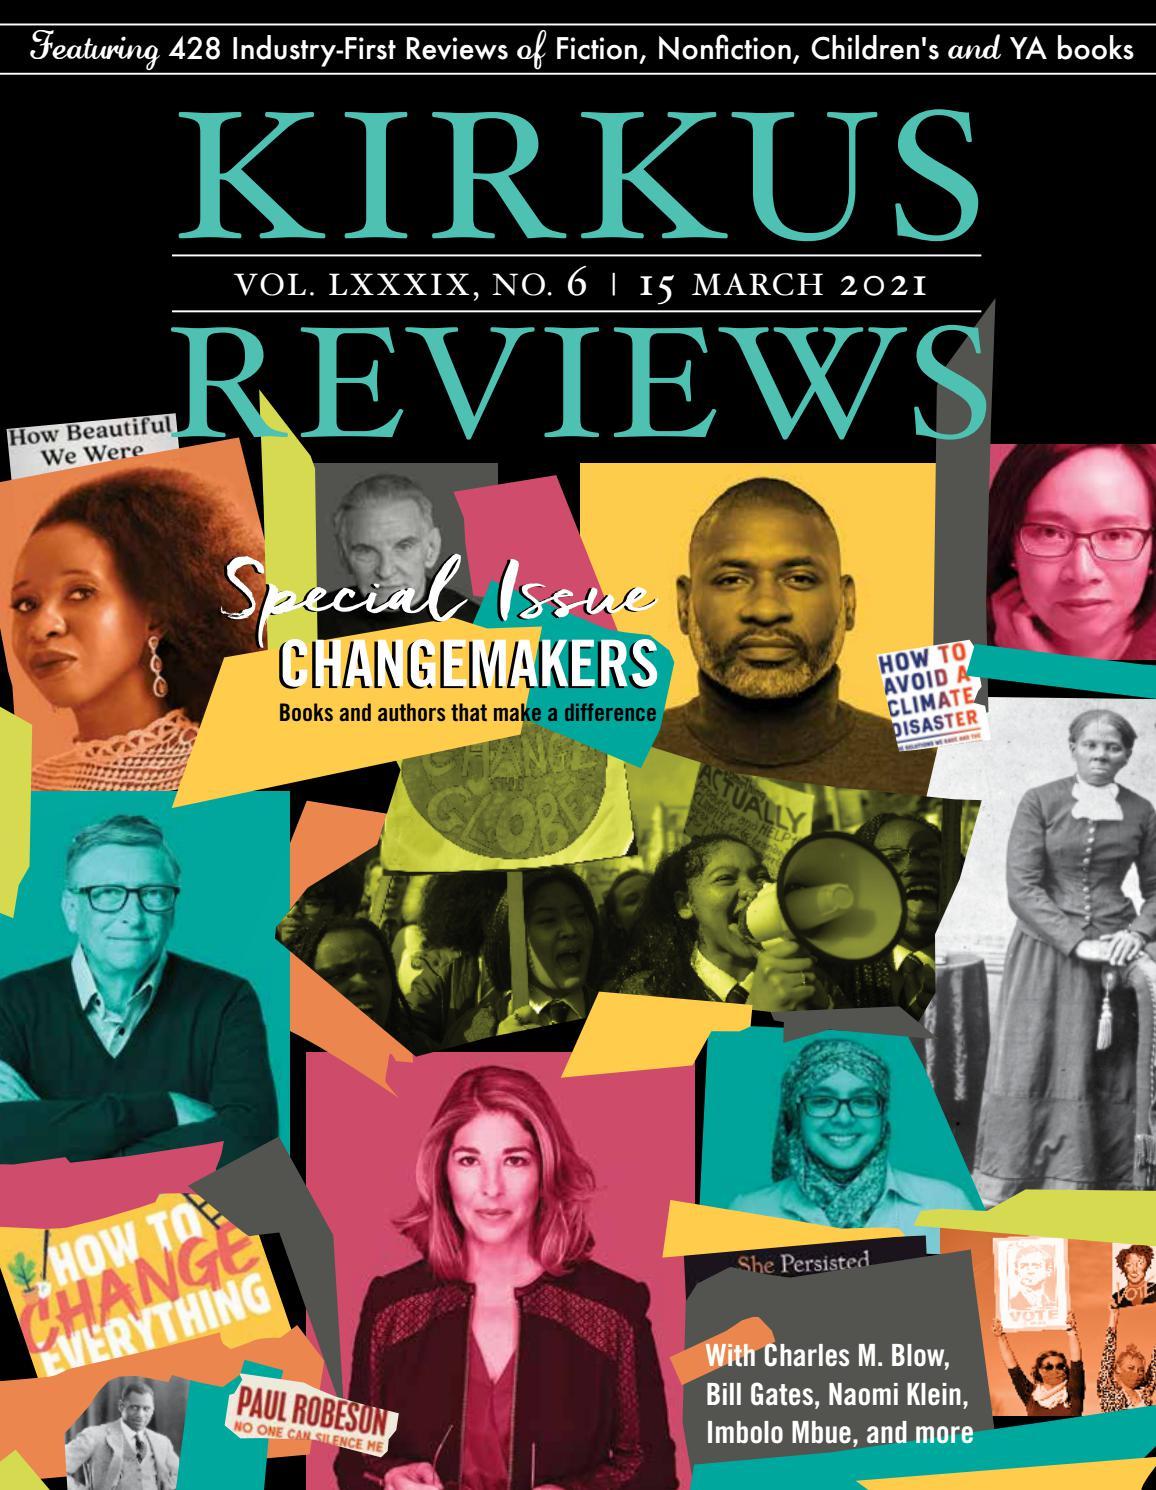 Avon Mark Christmas 2021 Sneak Peek Word Of Alicia March 15 2021 Volume Lxxxix No 6 By Kirkus Reviews Issuu